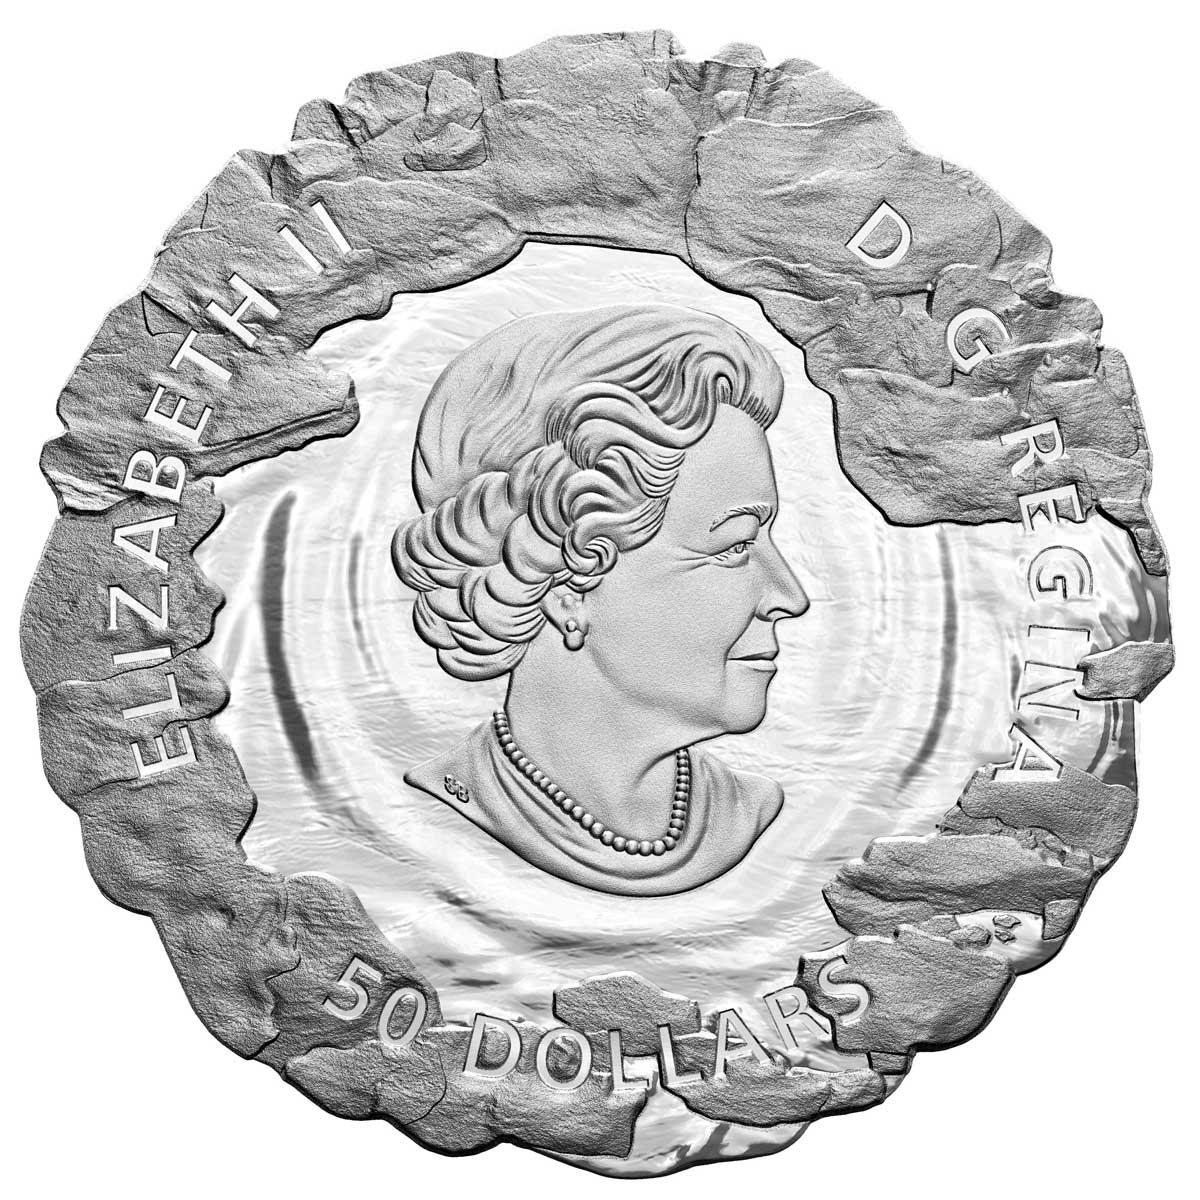 Канада монета 50 долларов Злополучная экспедиция сэра Джона Франклина, аверс